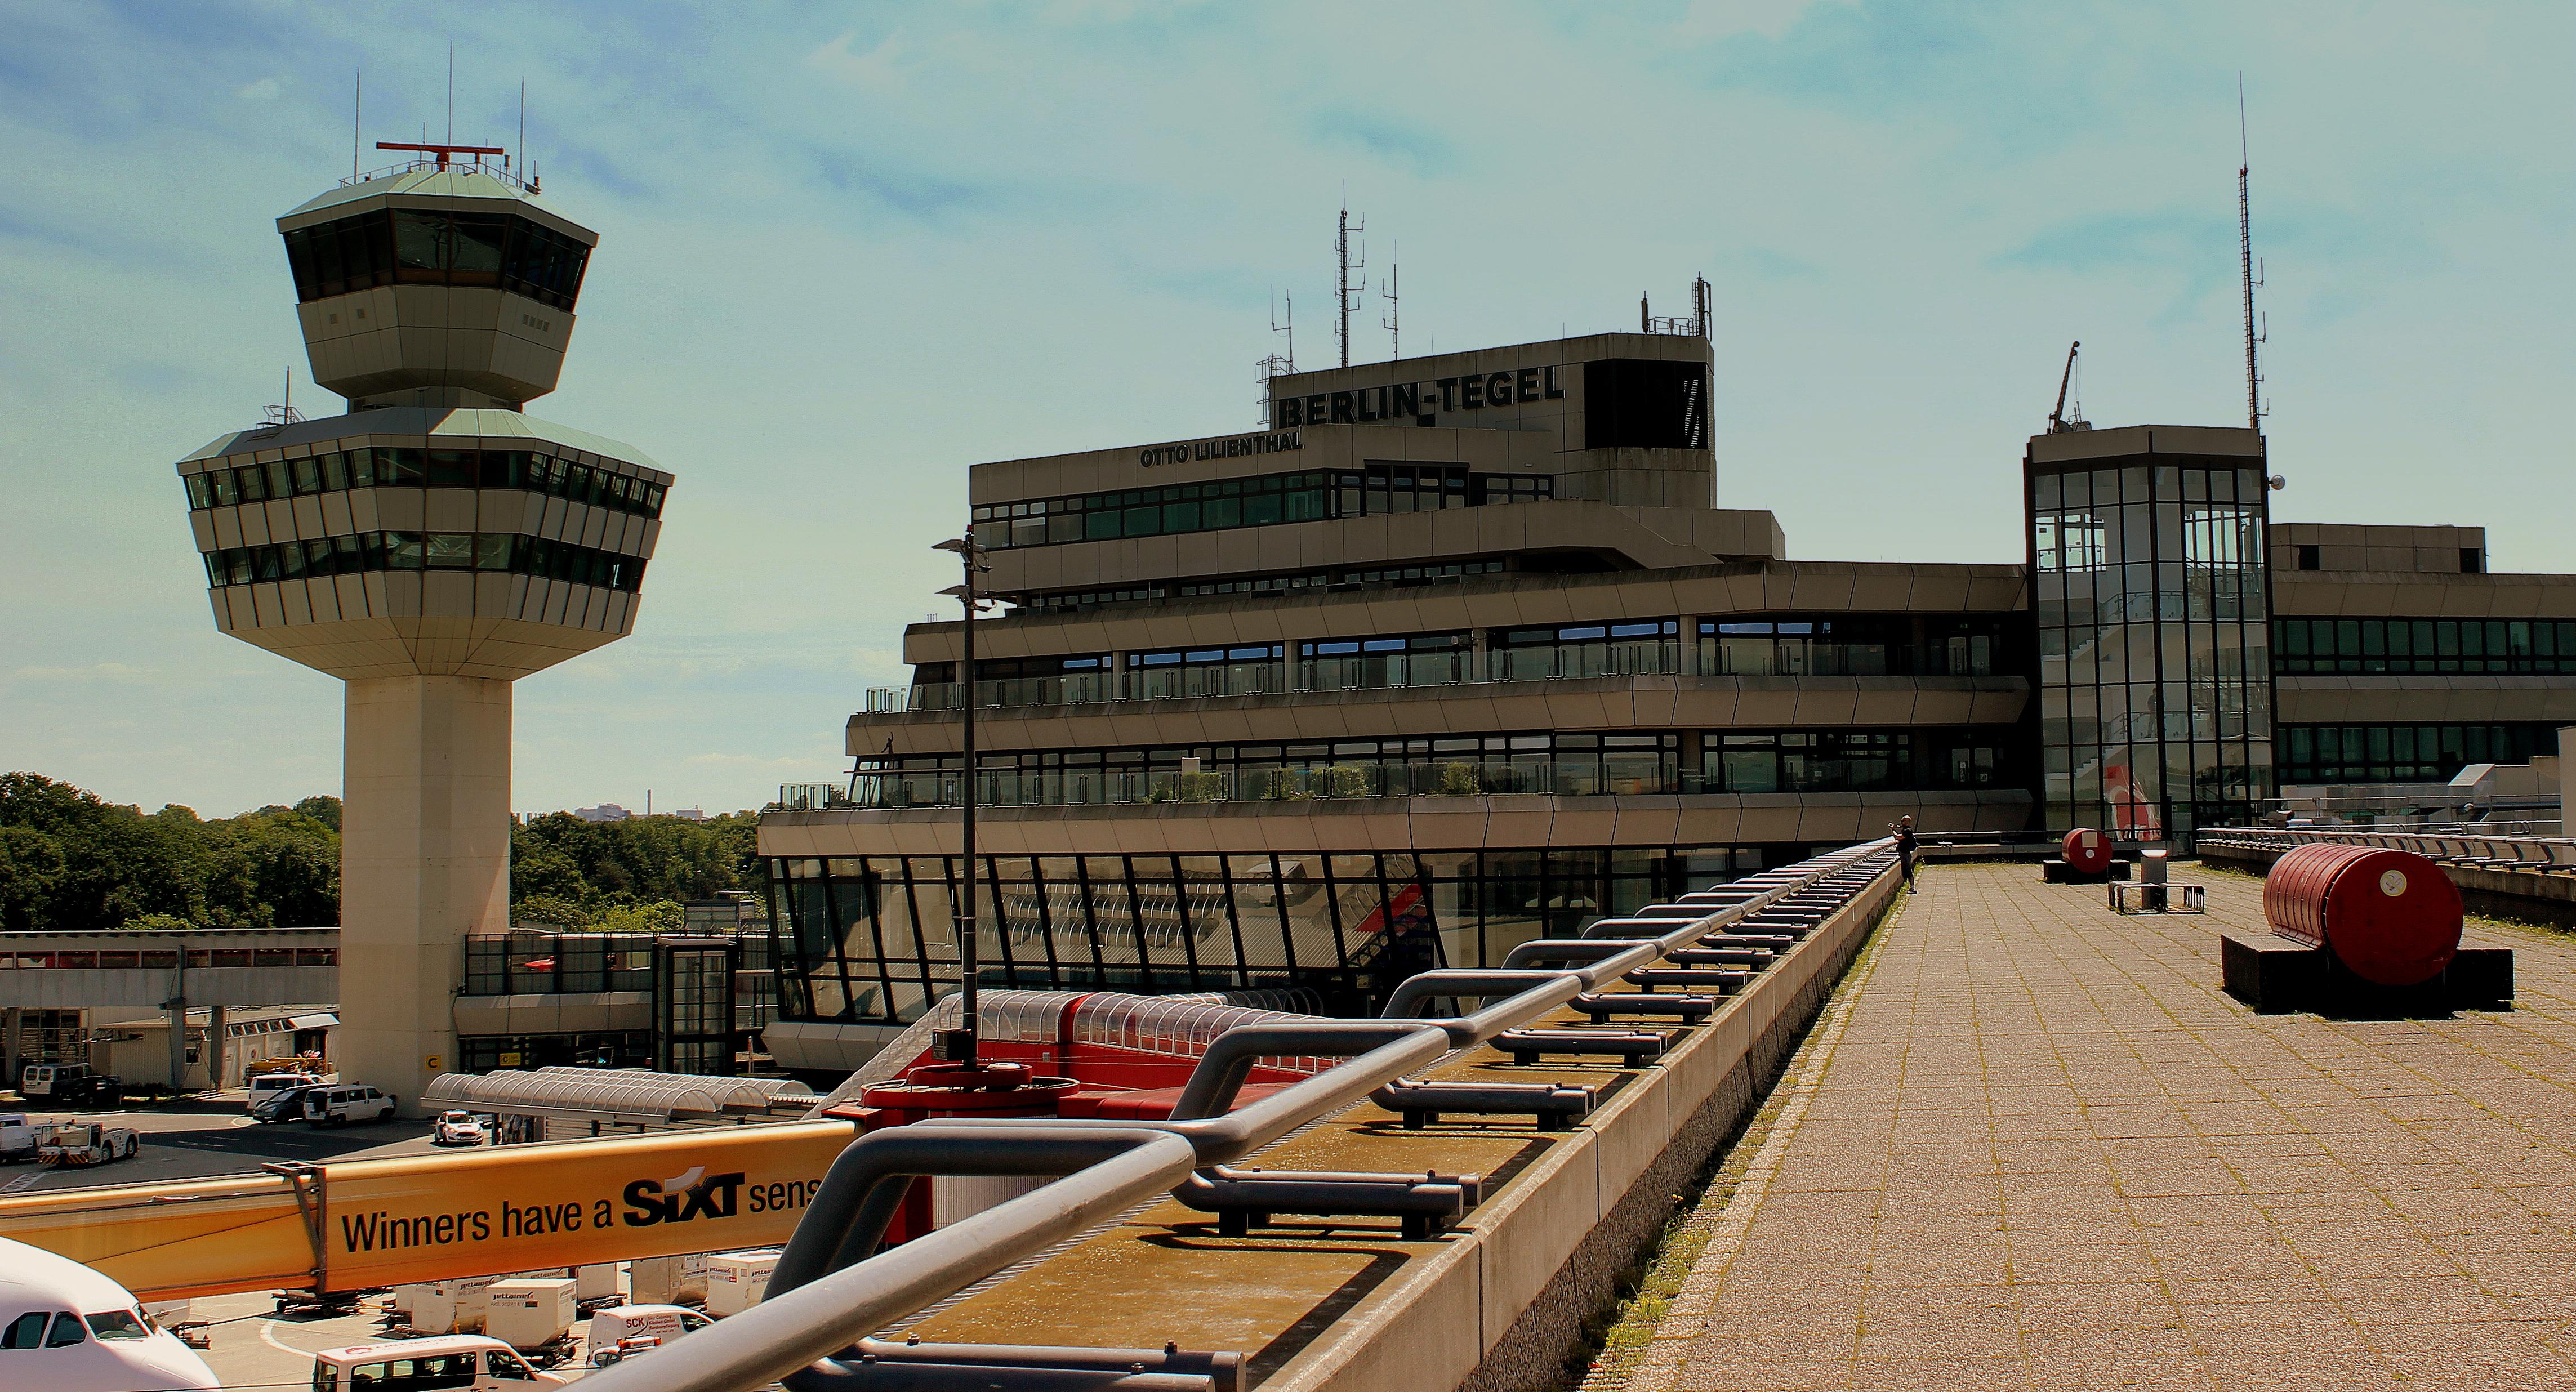 Berlin Tegel Airport